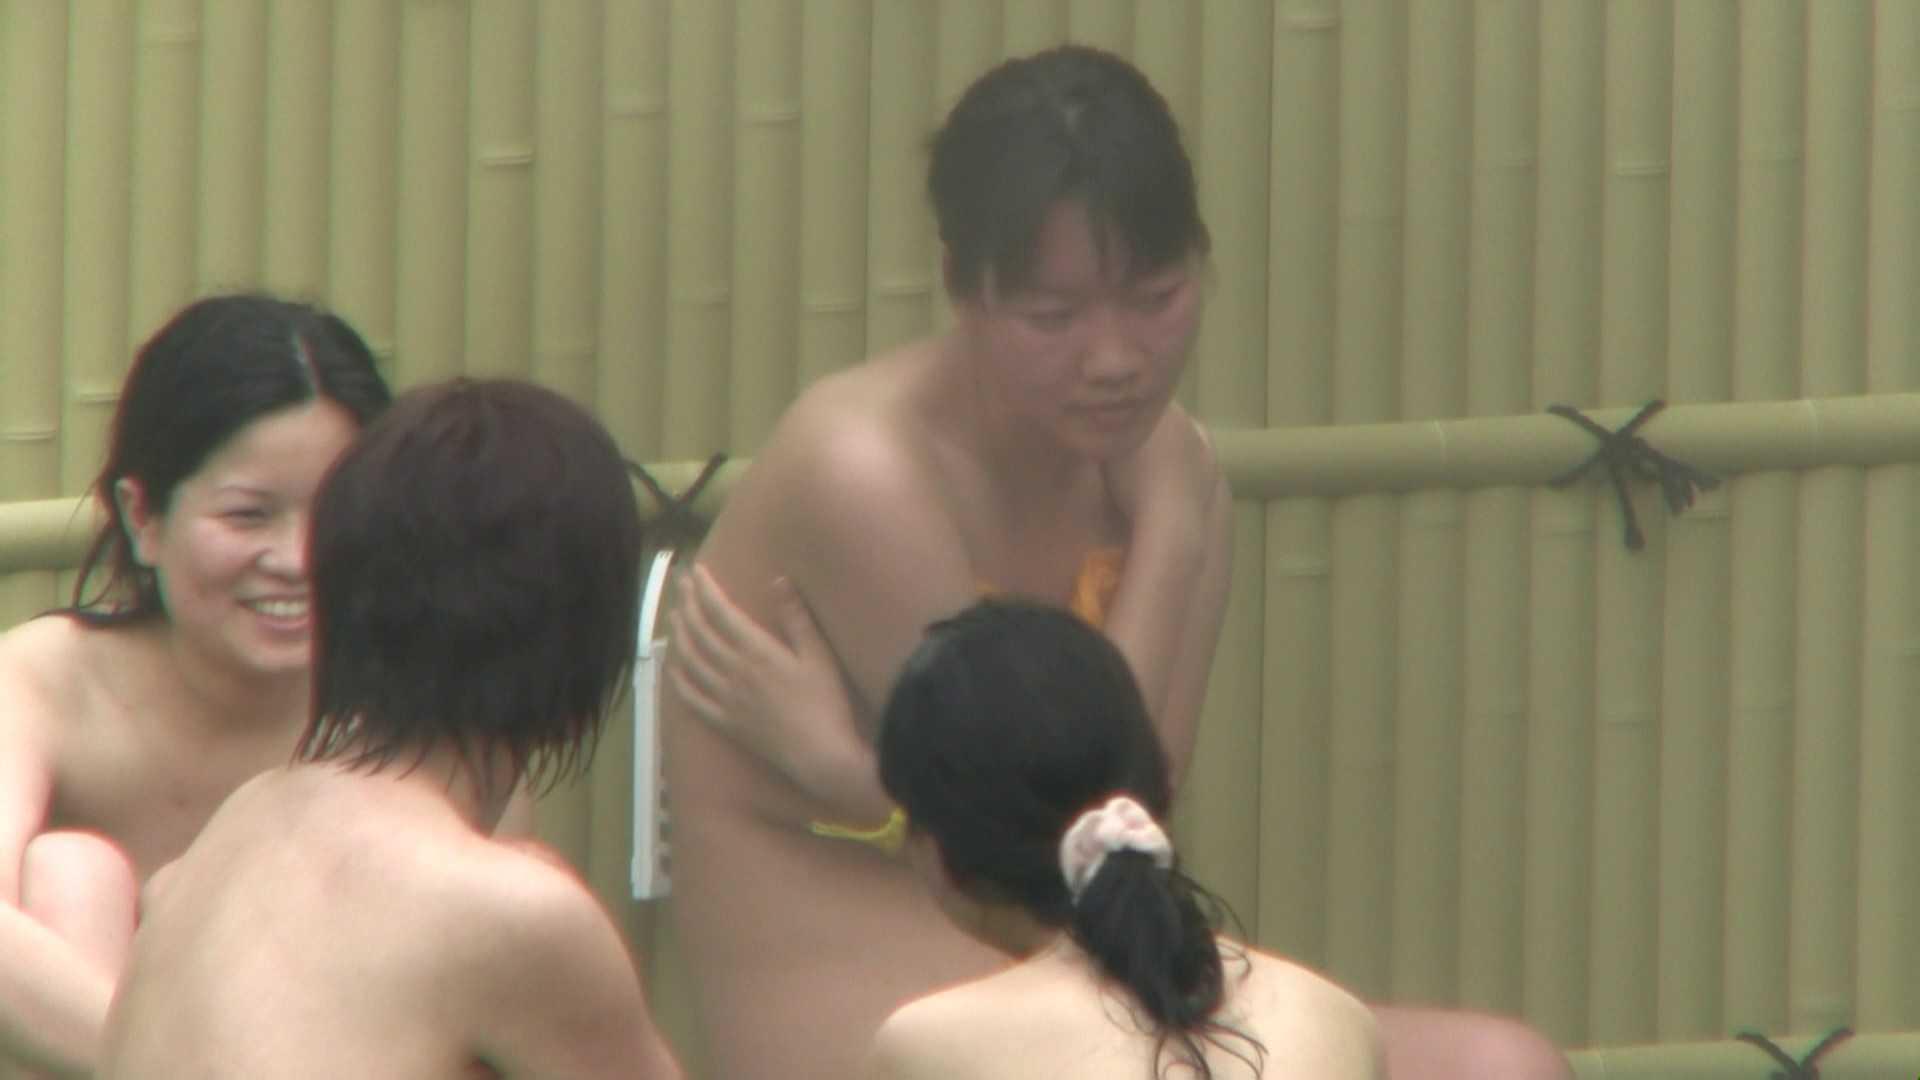 Aquaな露天風呂Vol.75【VIP限定】 露天風呂編 | 盗撮シリーズ  99PIX 49